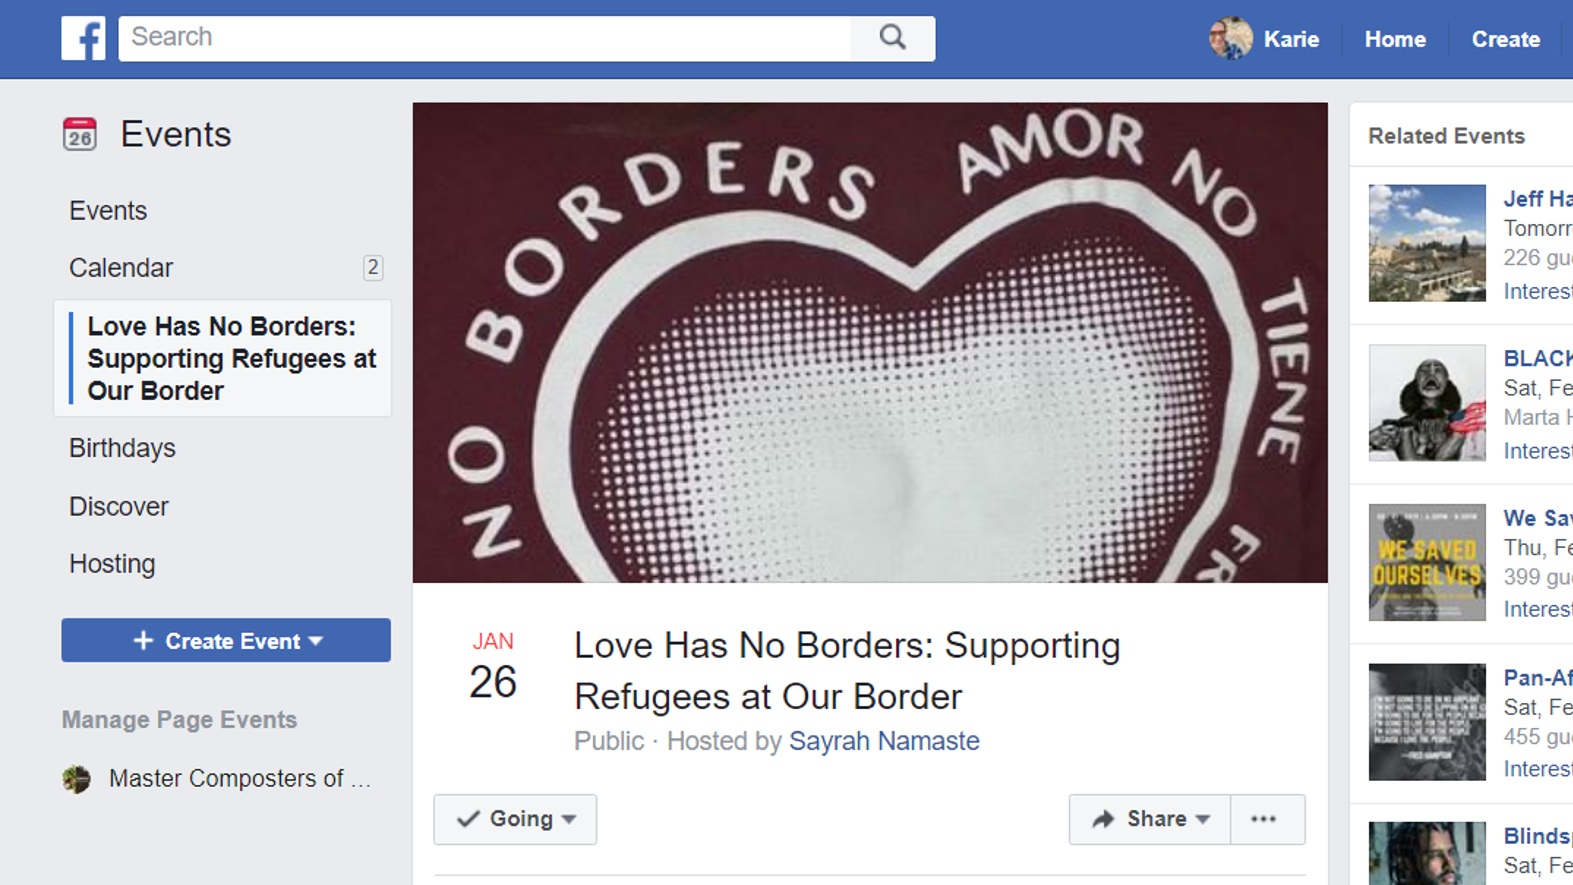 2019-01-26 - Love Has No Borders.png